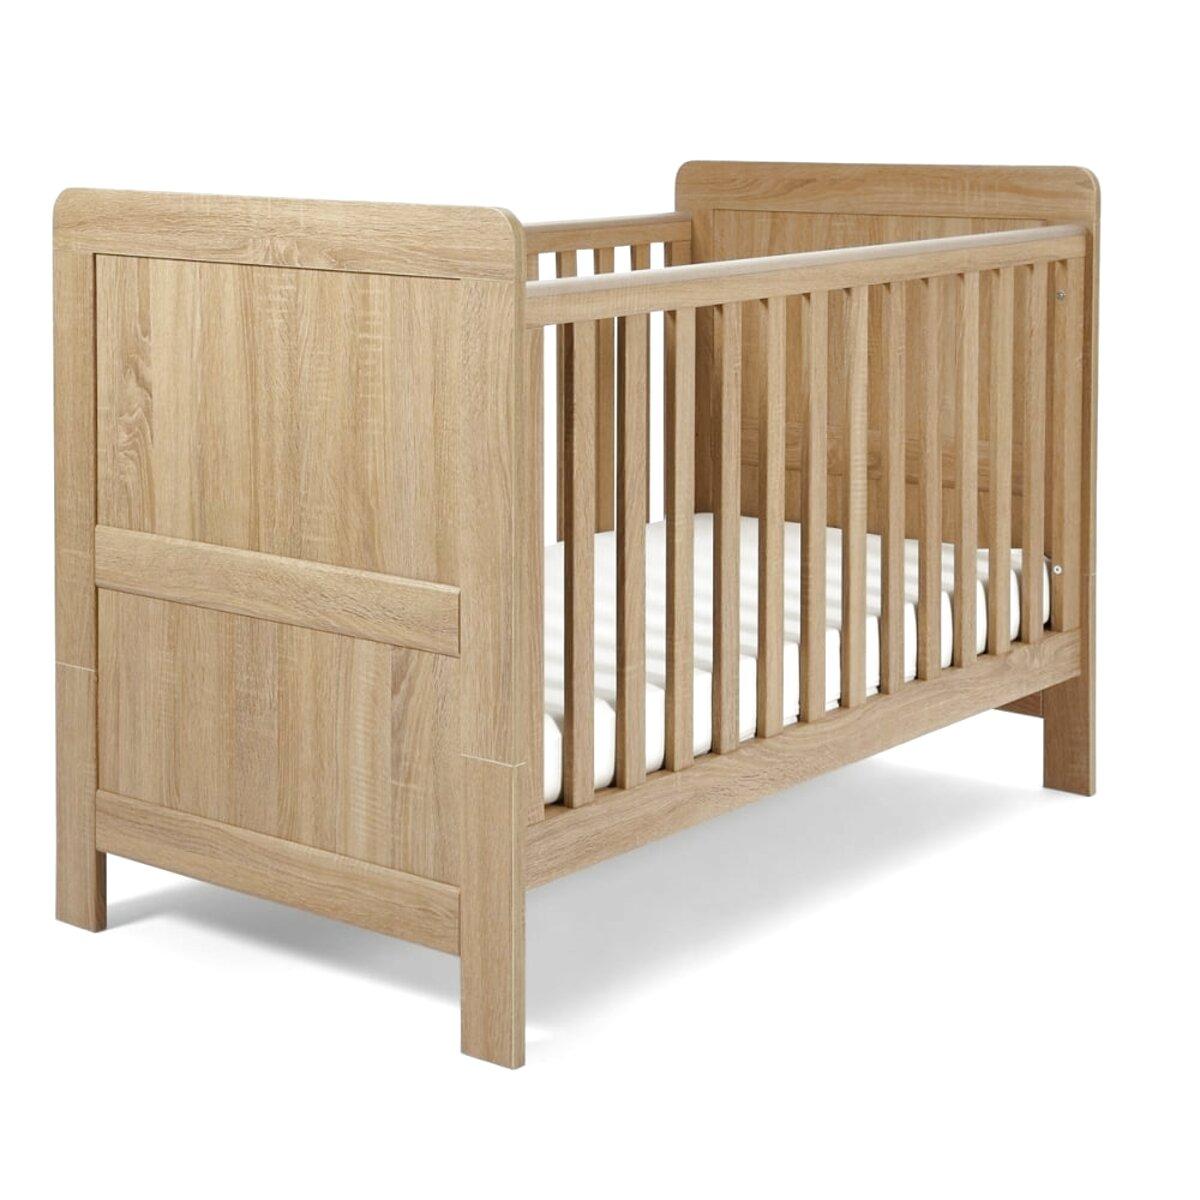 oak cot for sale